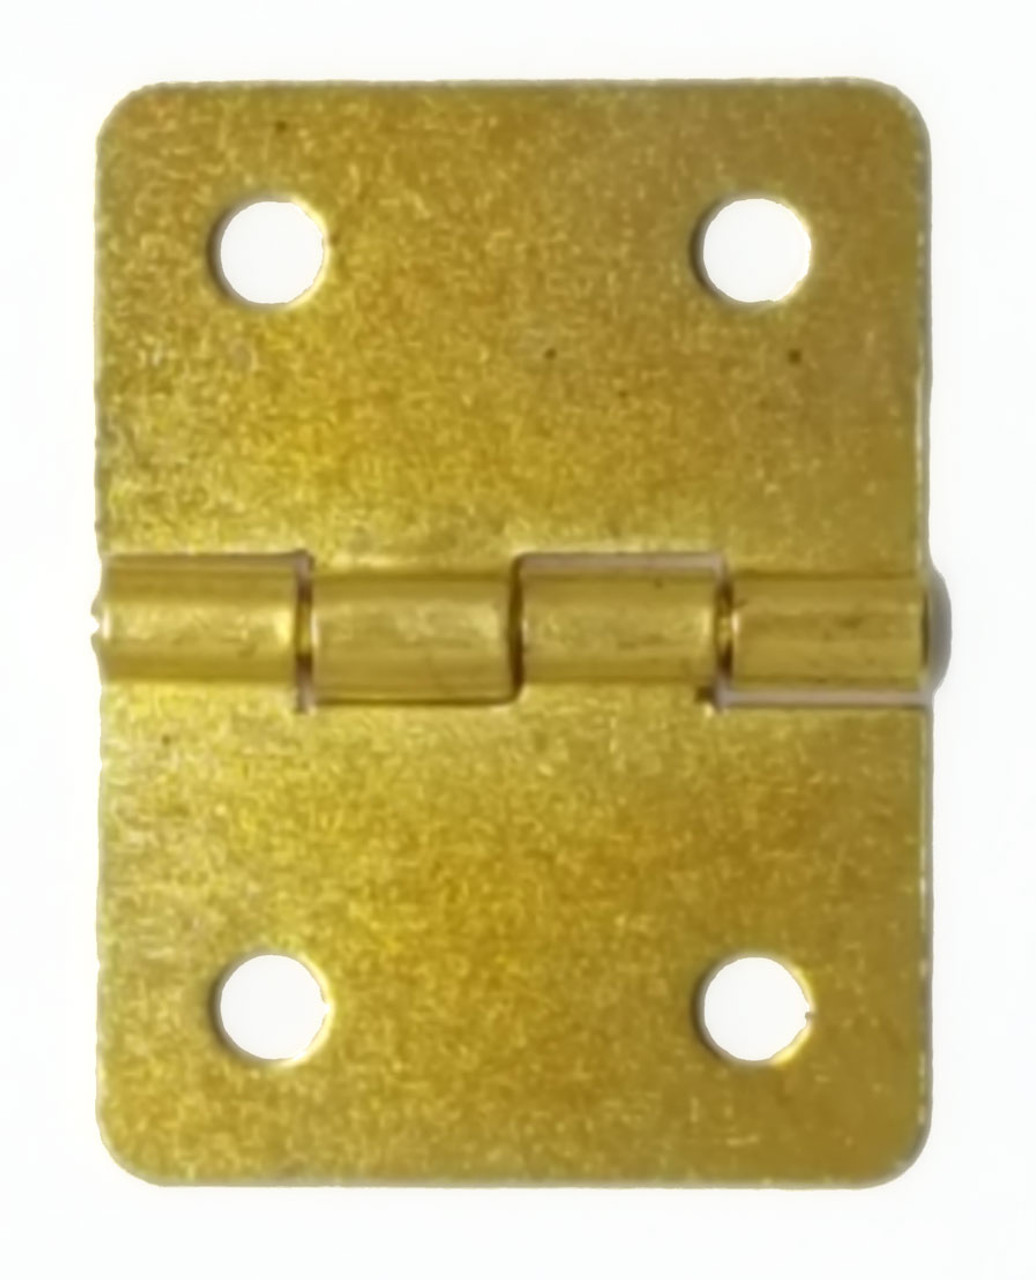 BRASS Plate - 3/4x1 inch hinge